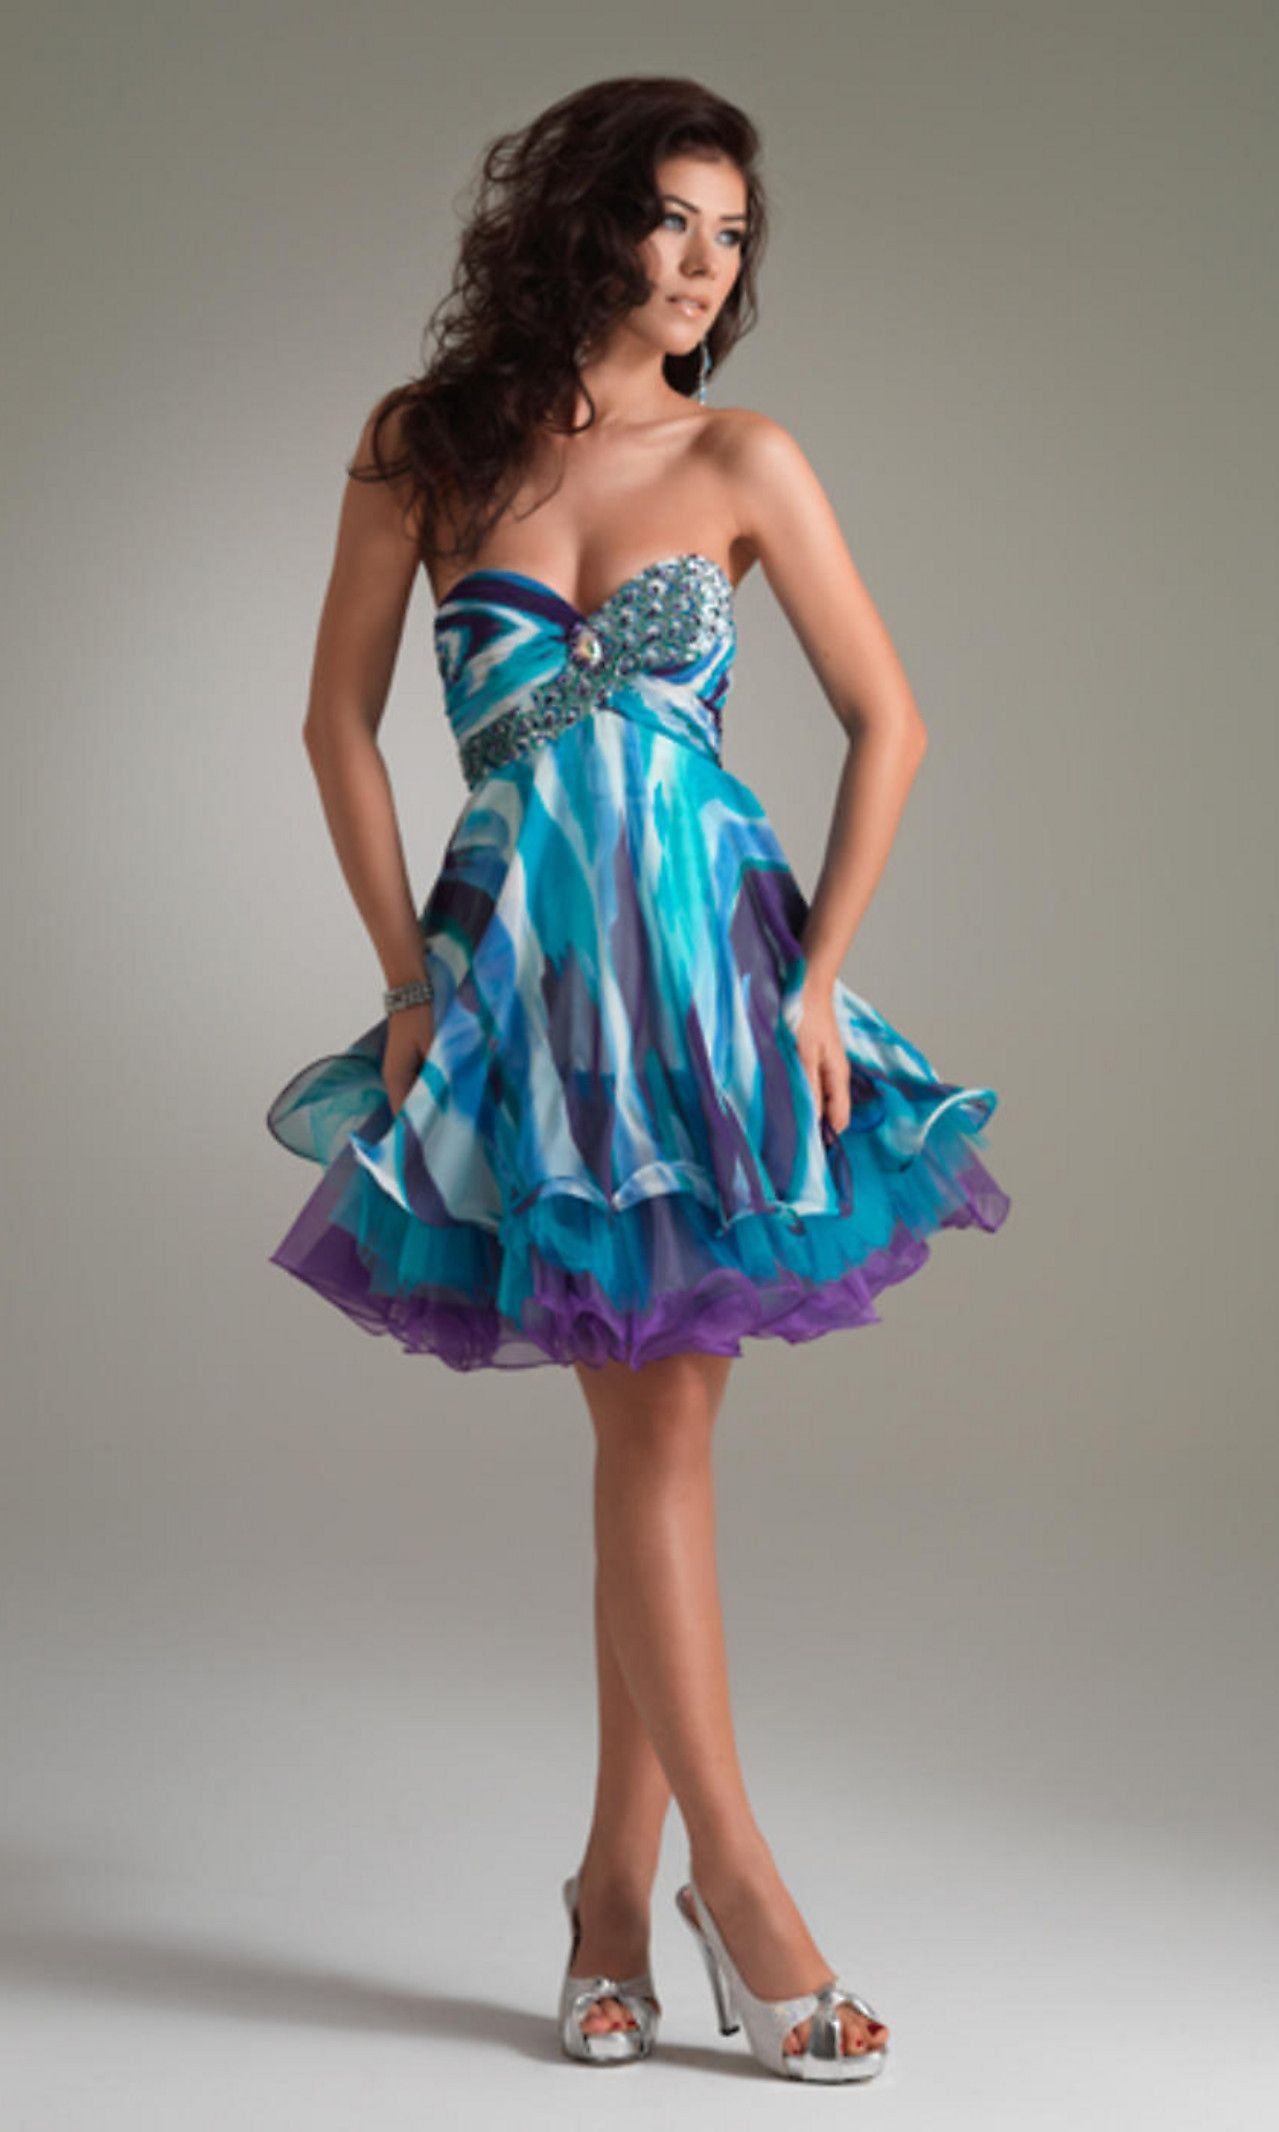 Short Multi-Color Homecoming Dress by Jasz | Dresses | Pinterest ...